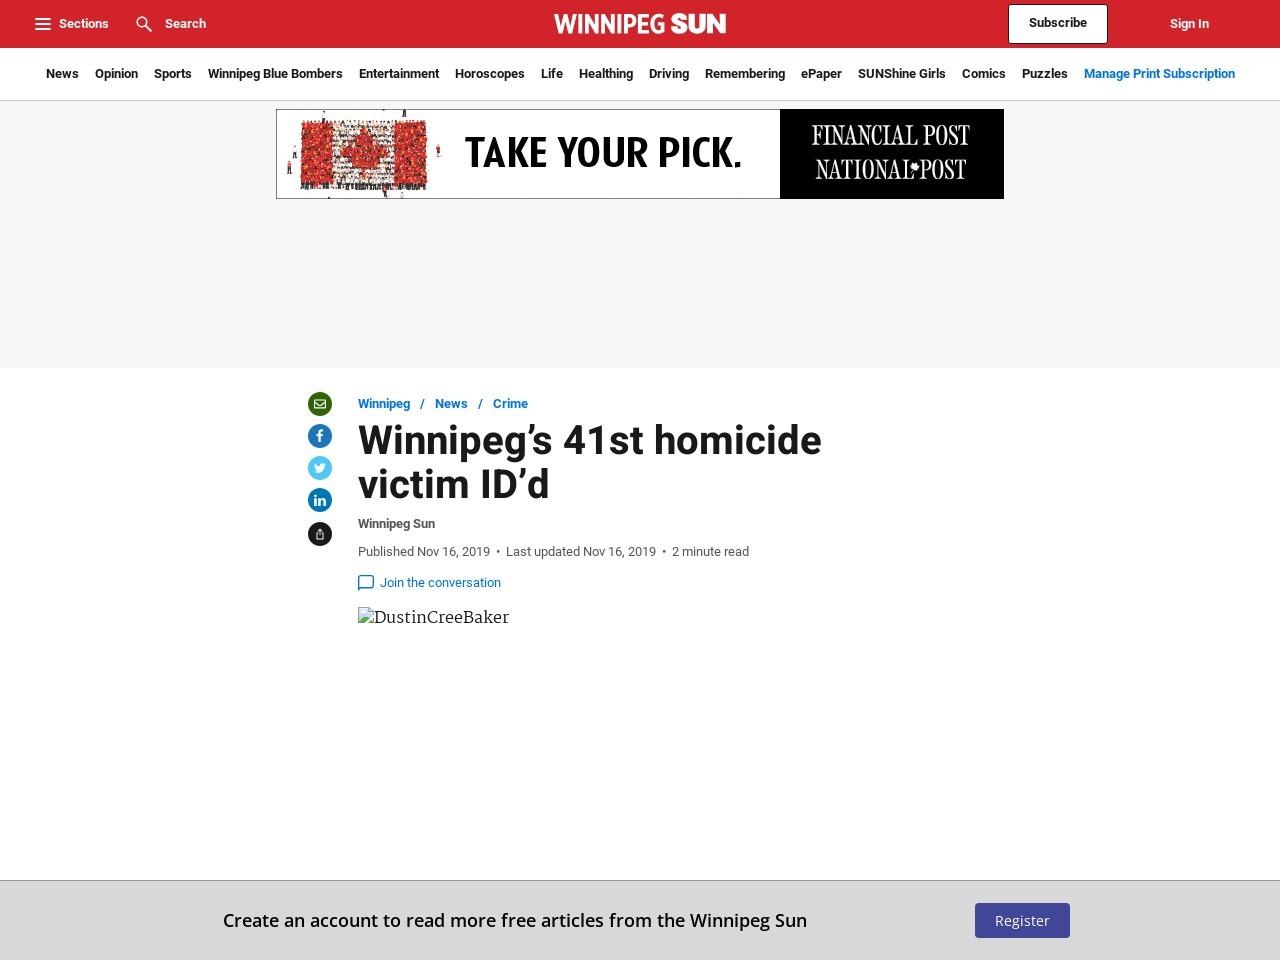 Winnipeg's 41st homicide victim ID'd